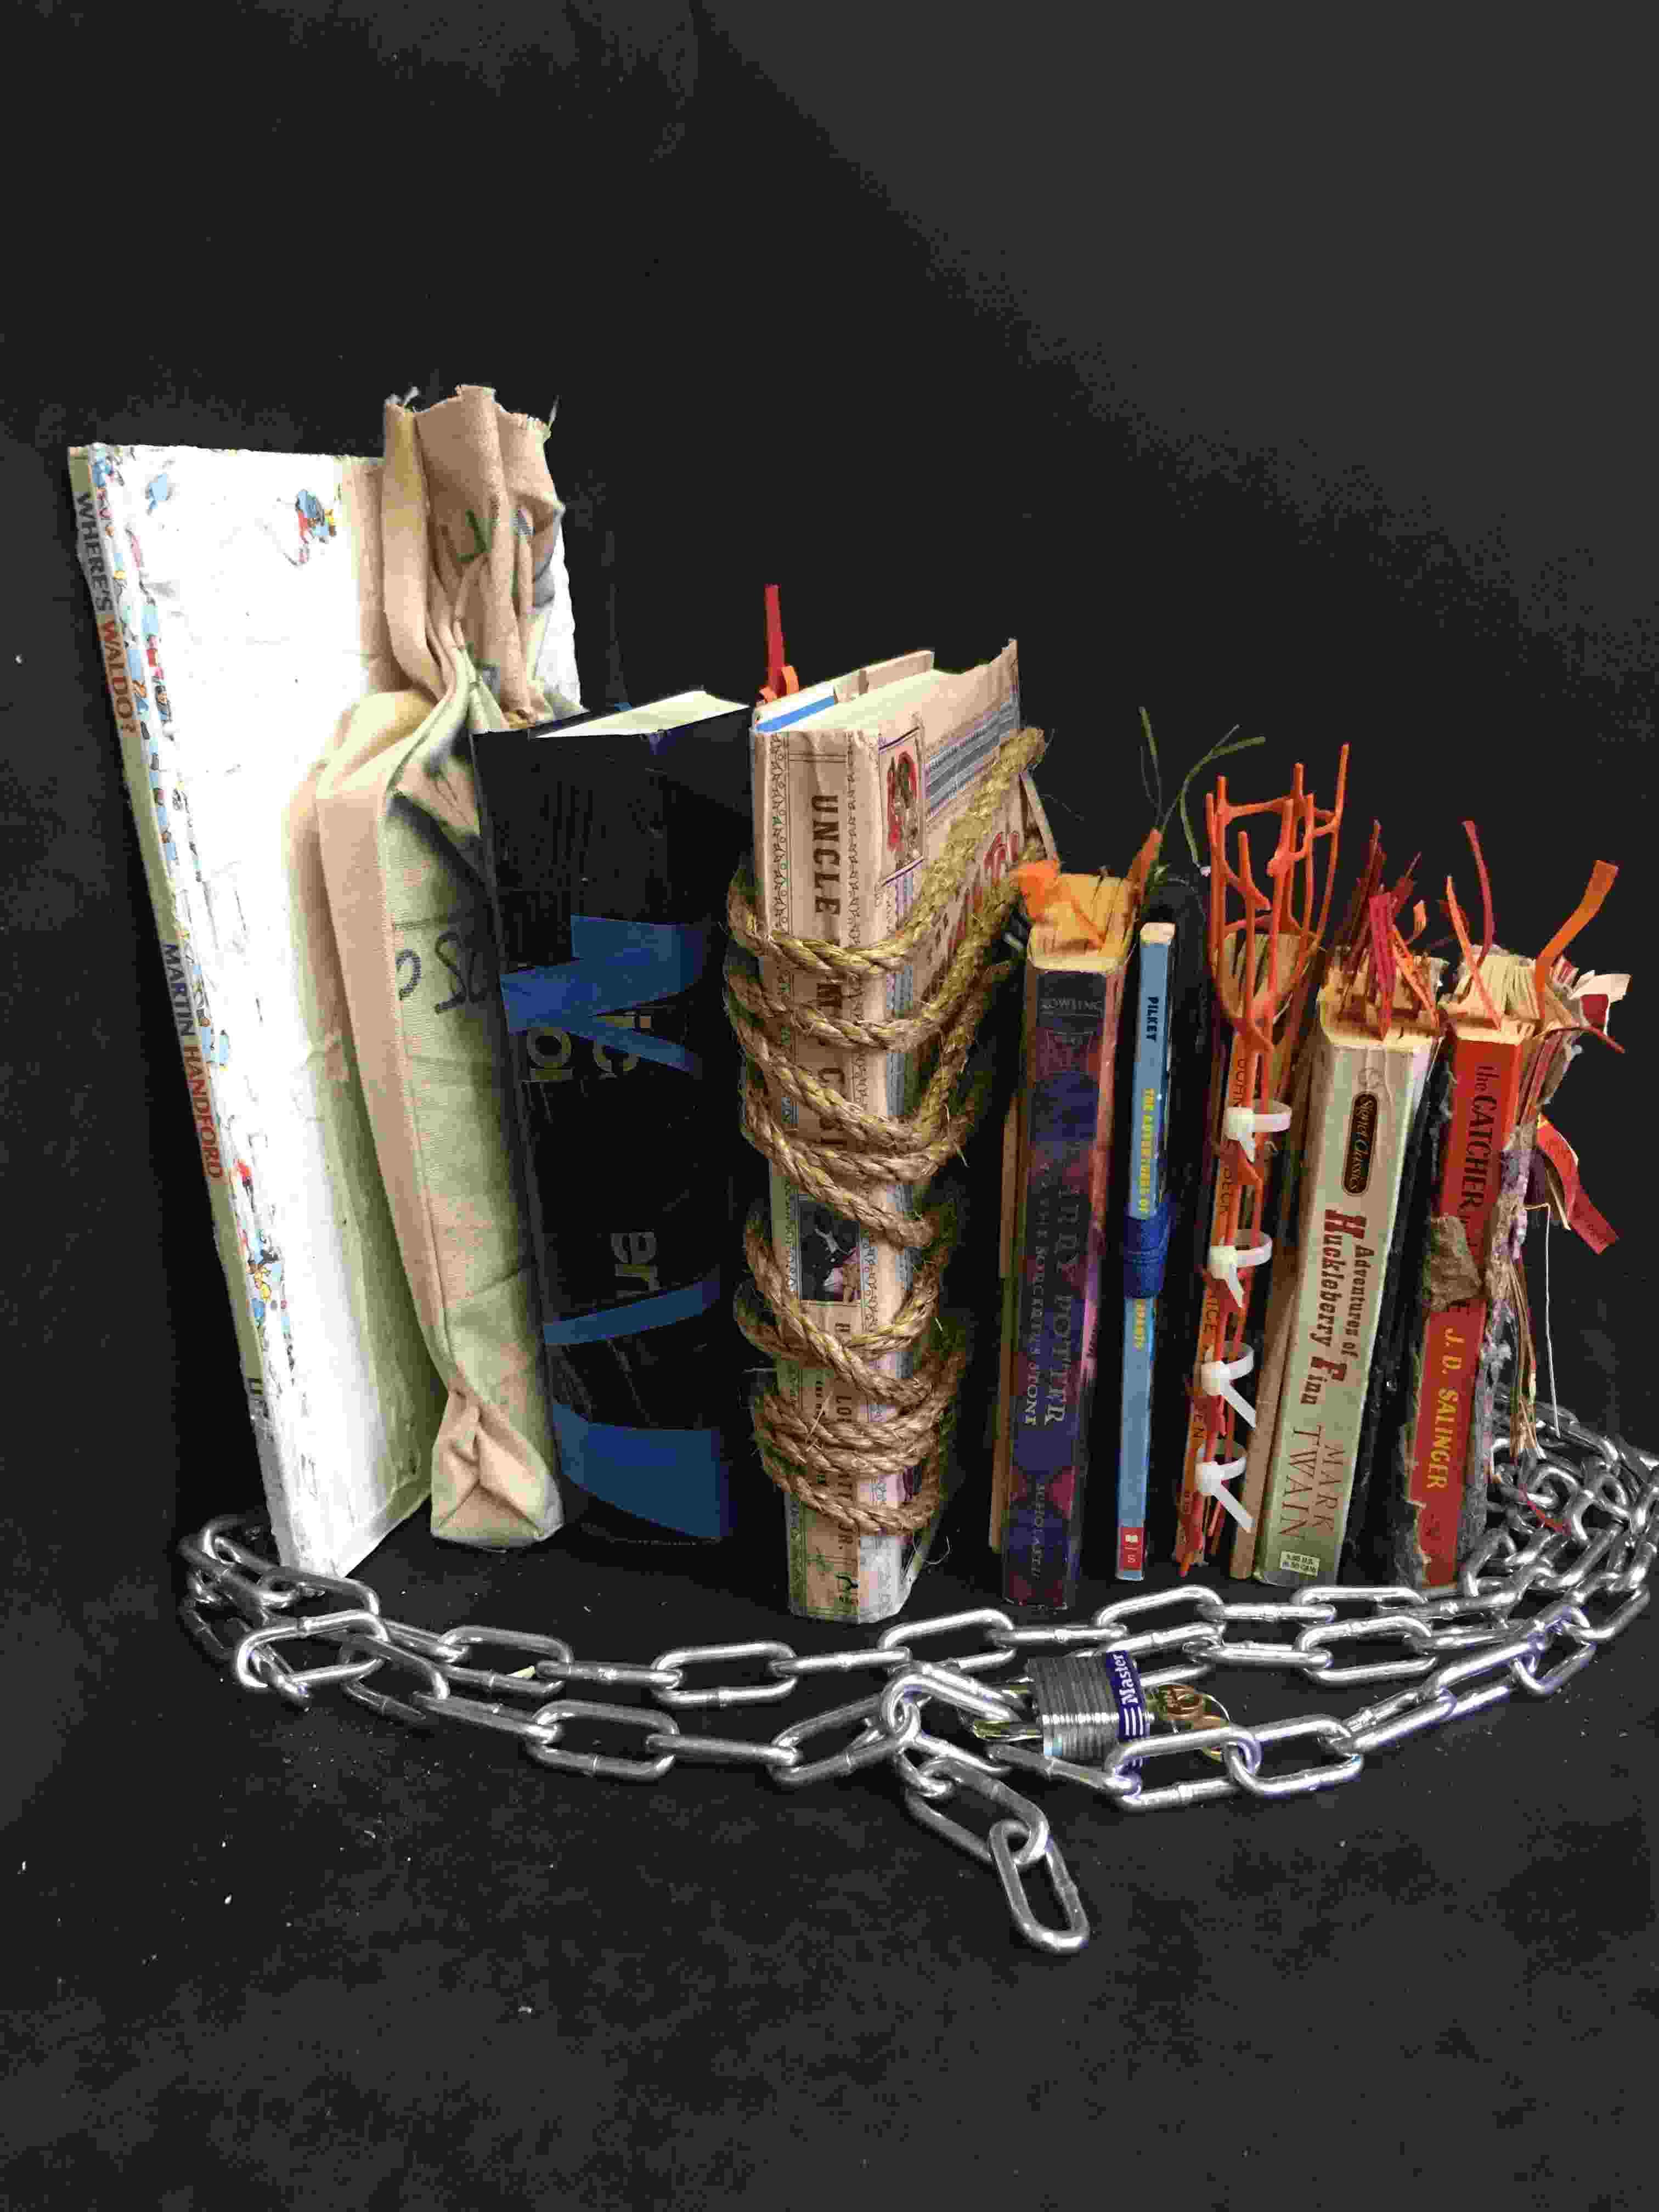 3) BOOKWORKS Serling-Sturm